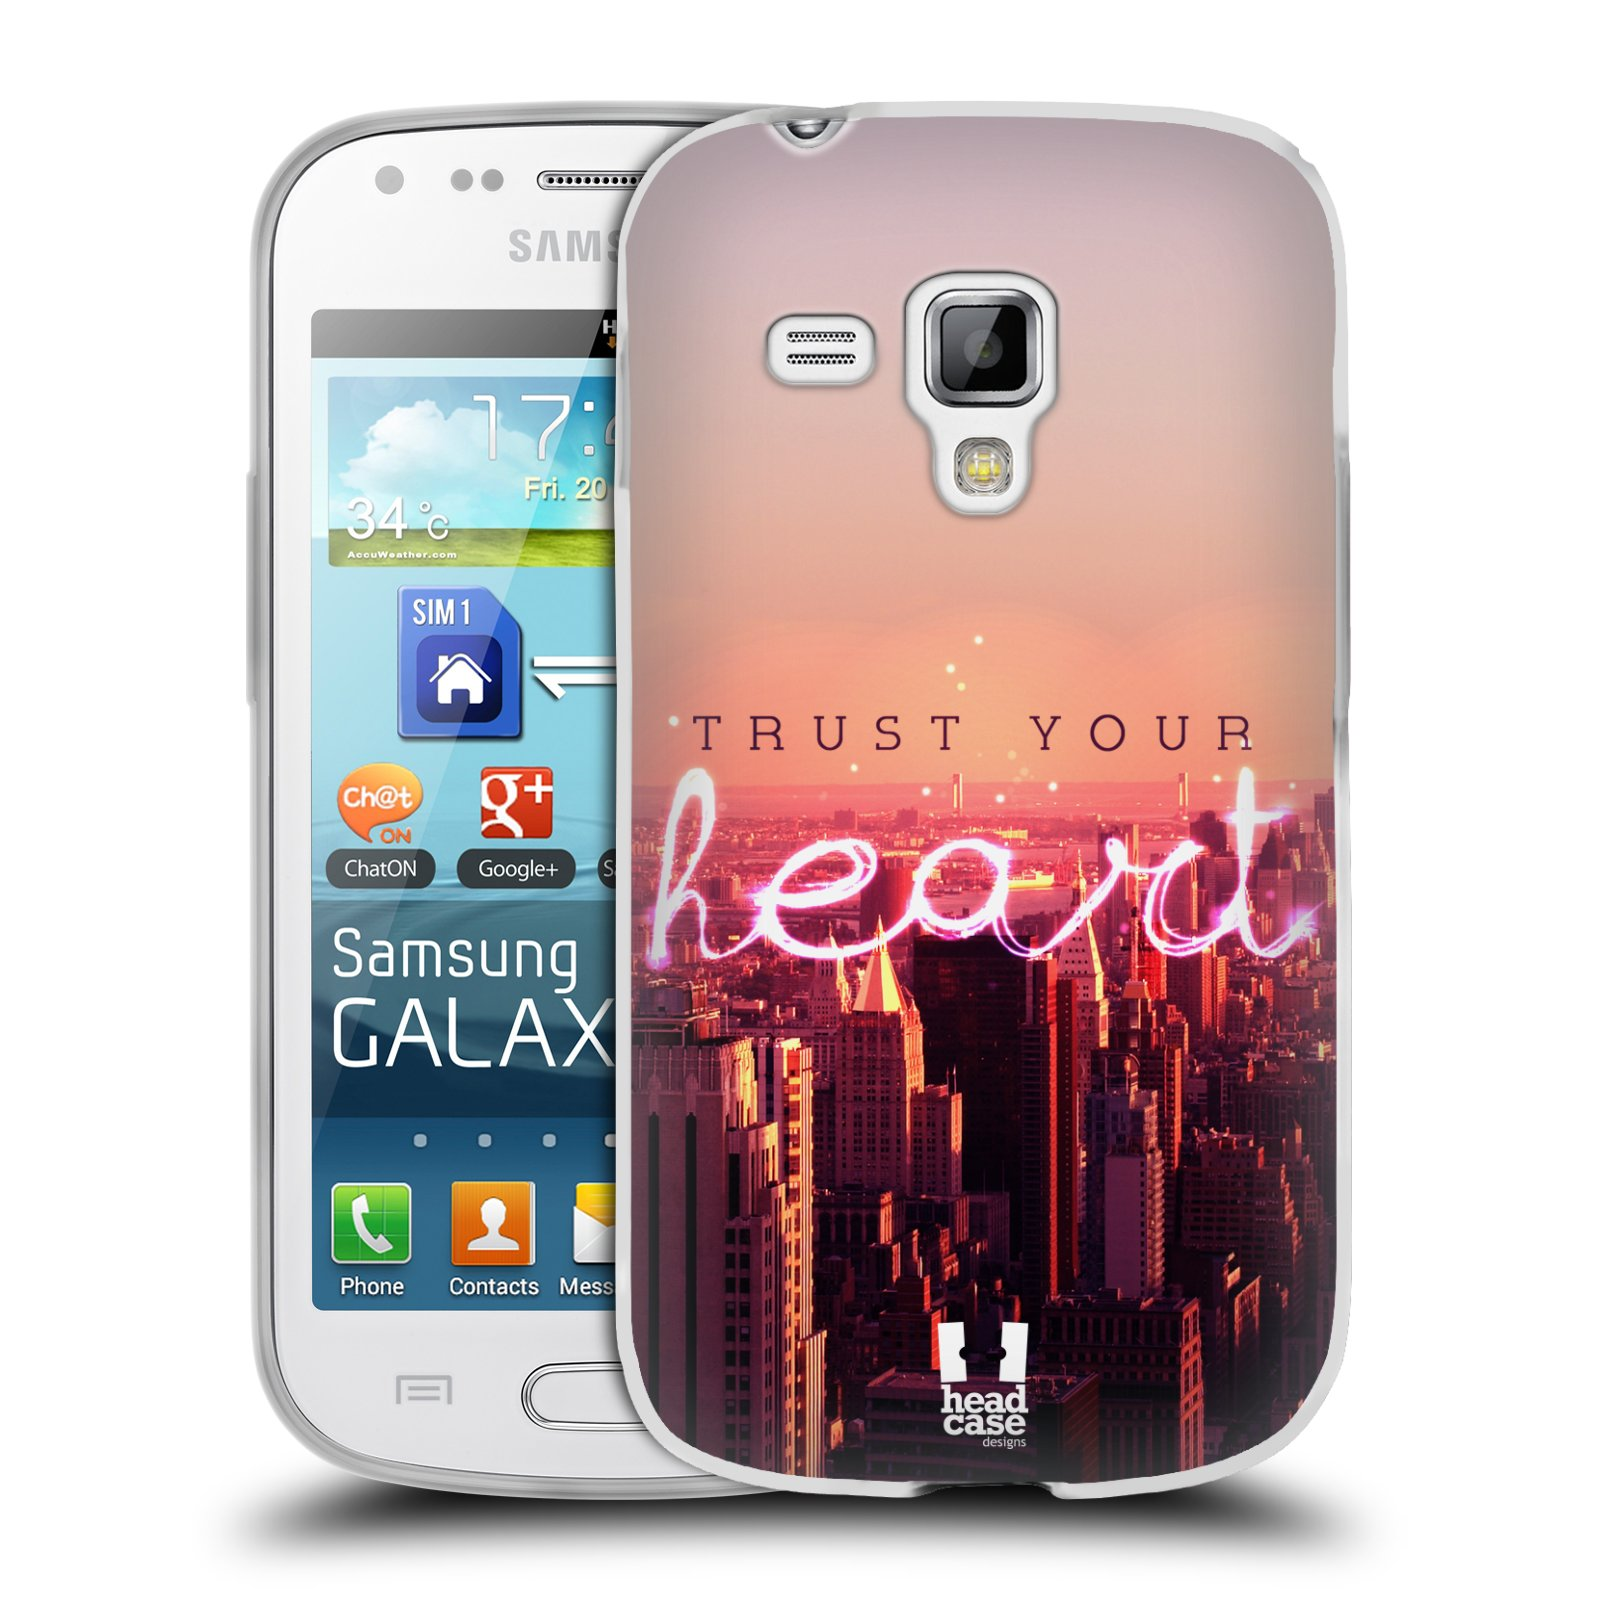 Silikonové pouzdro na mobil Samsung Galaxy Trend Plus HEAD CASE TRUST YOUR HEART (Silikonový kryt či obal na mobilní telefon Samsung Galaxy Trend Plus GT-S7580)